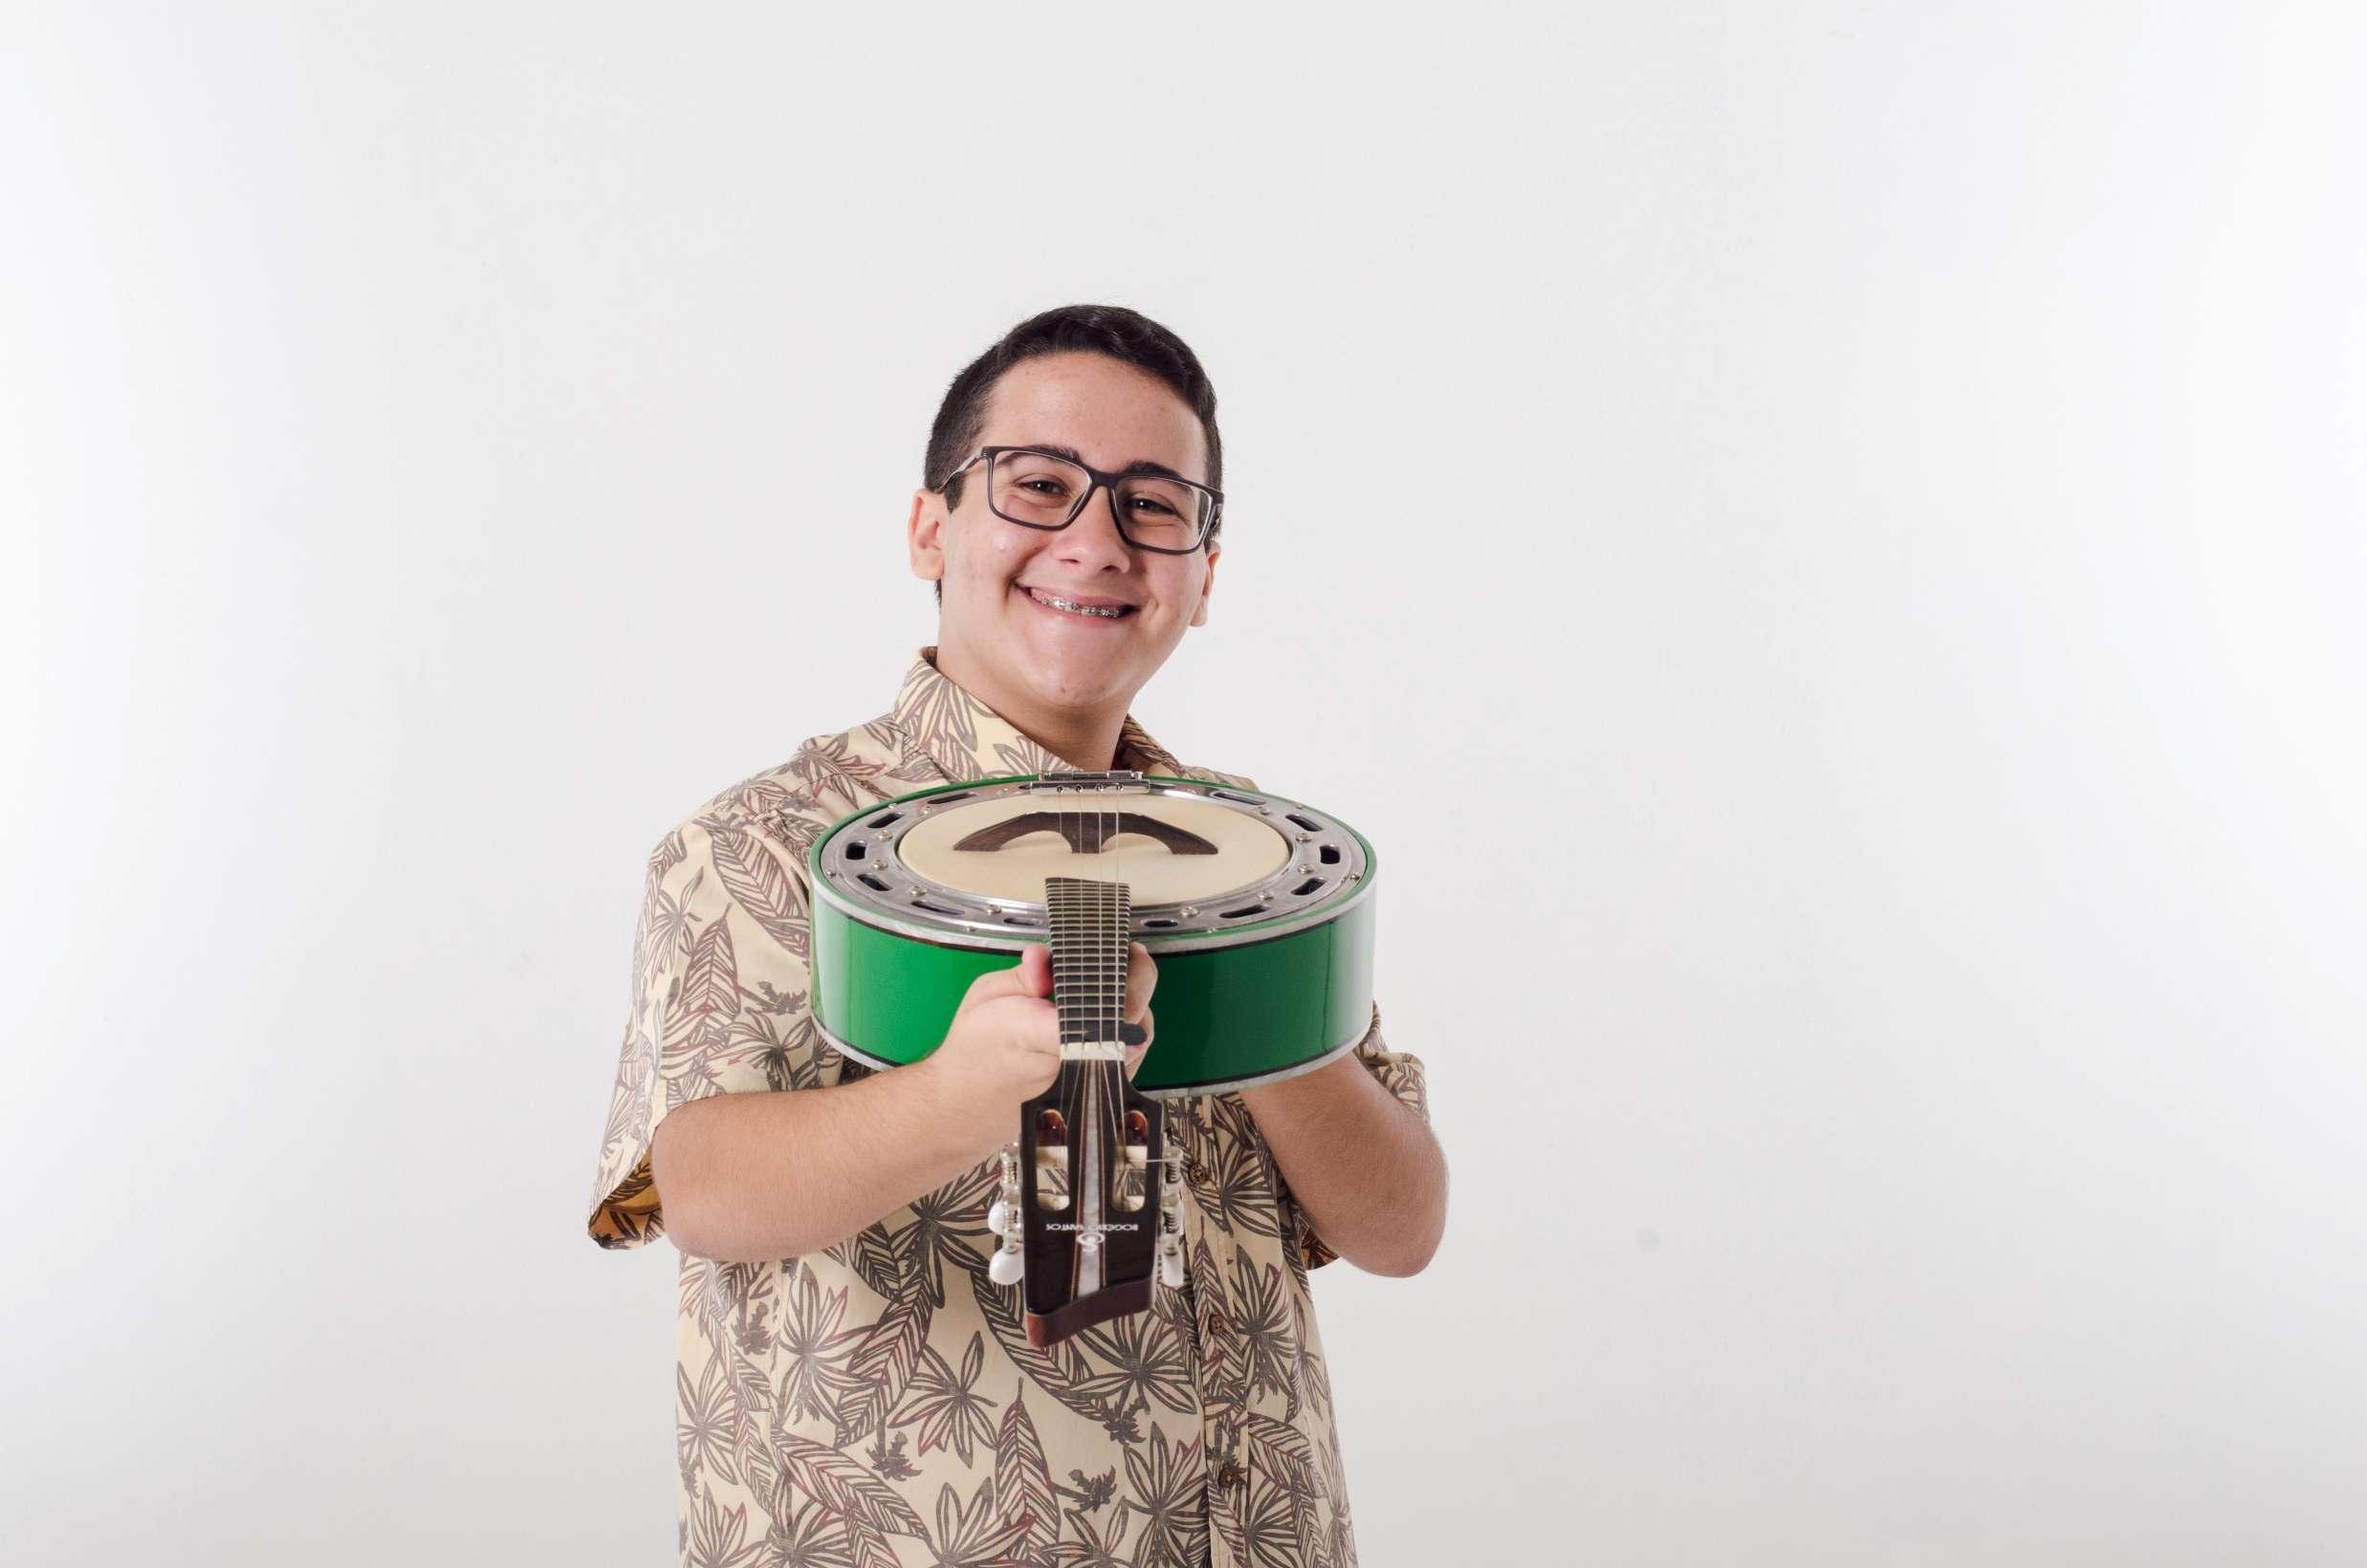 O jovem Sambista Enzo Belmonte lança single